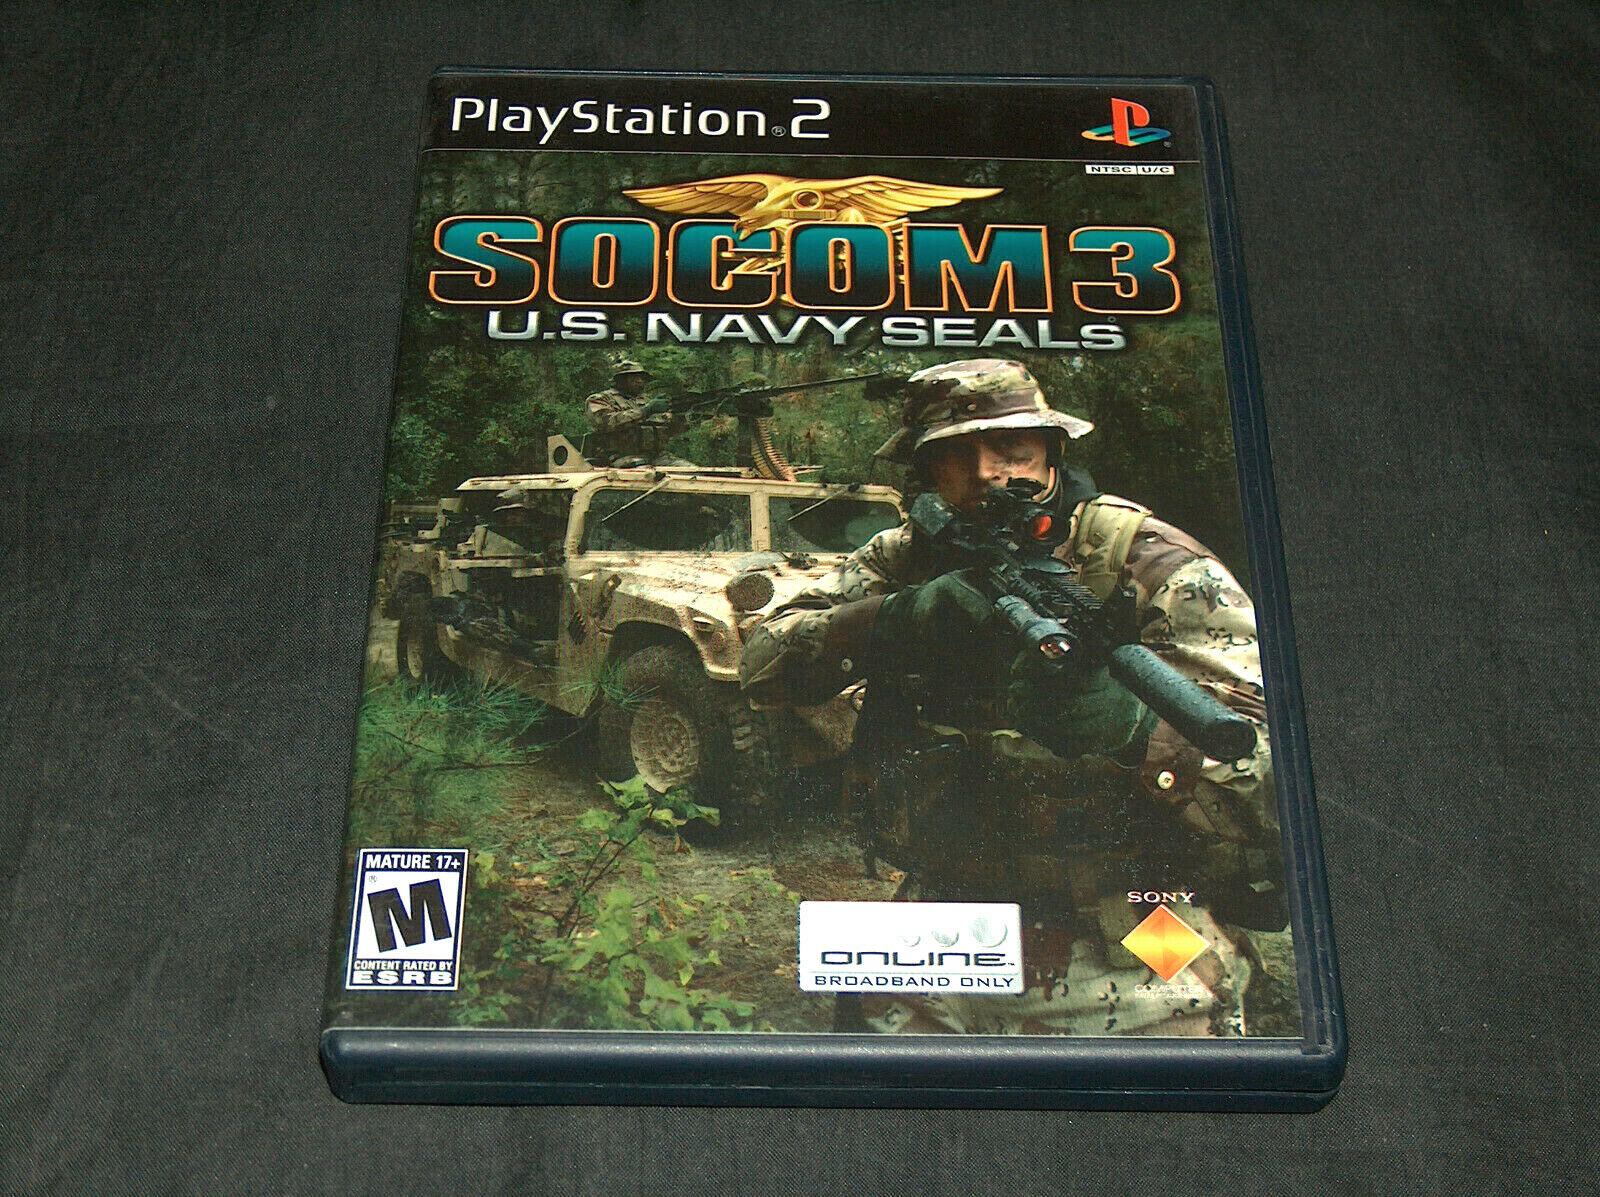 2005 Sony PlayStation 2 PS2 SOCOM 3 U.S. Navy Seals Online Video Game M NMMT